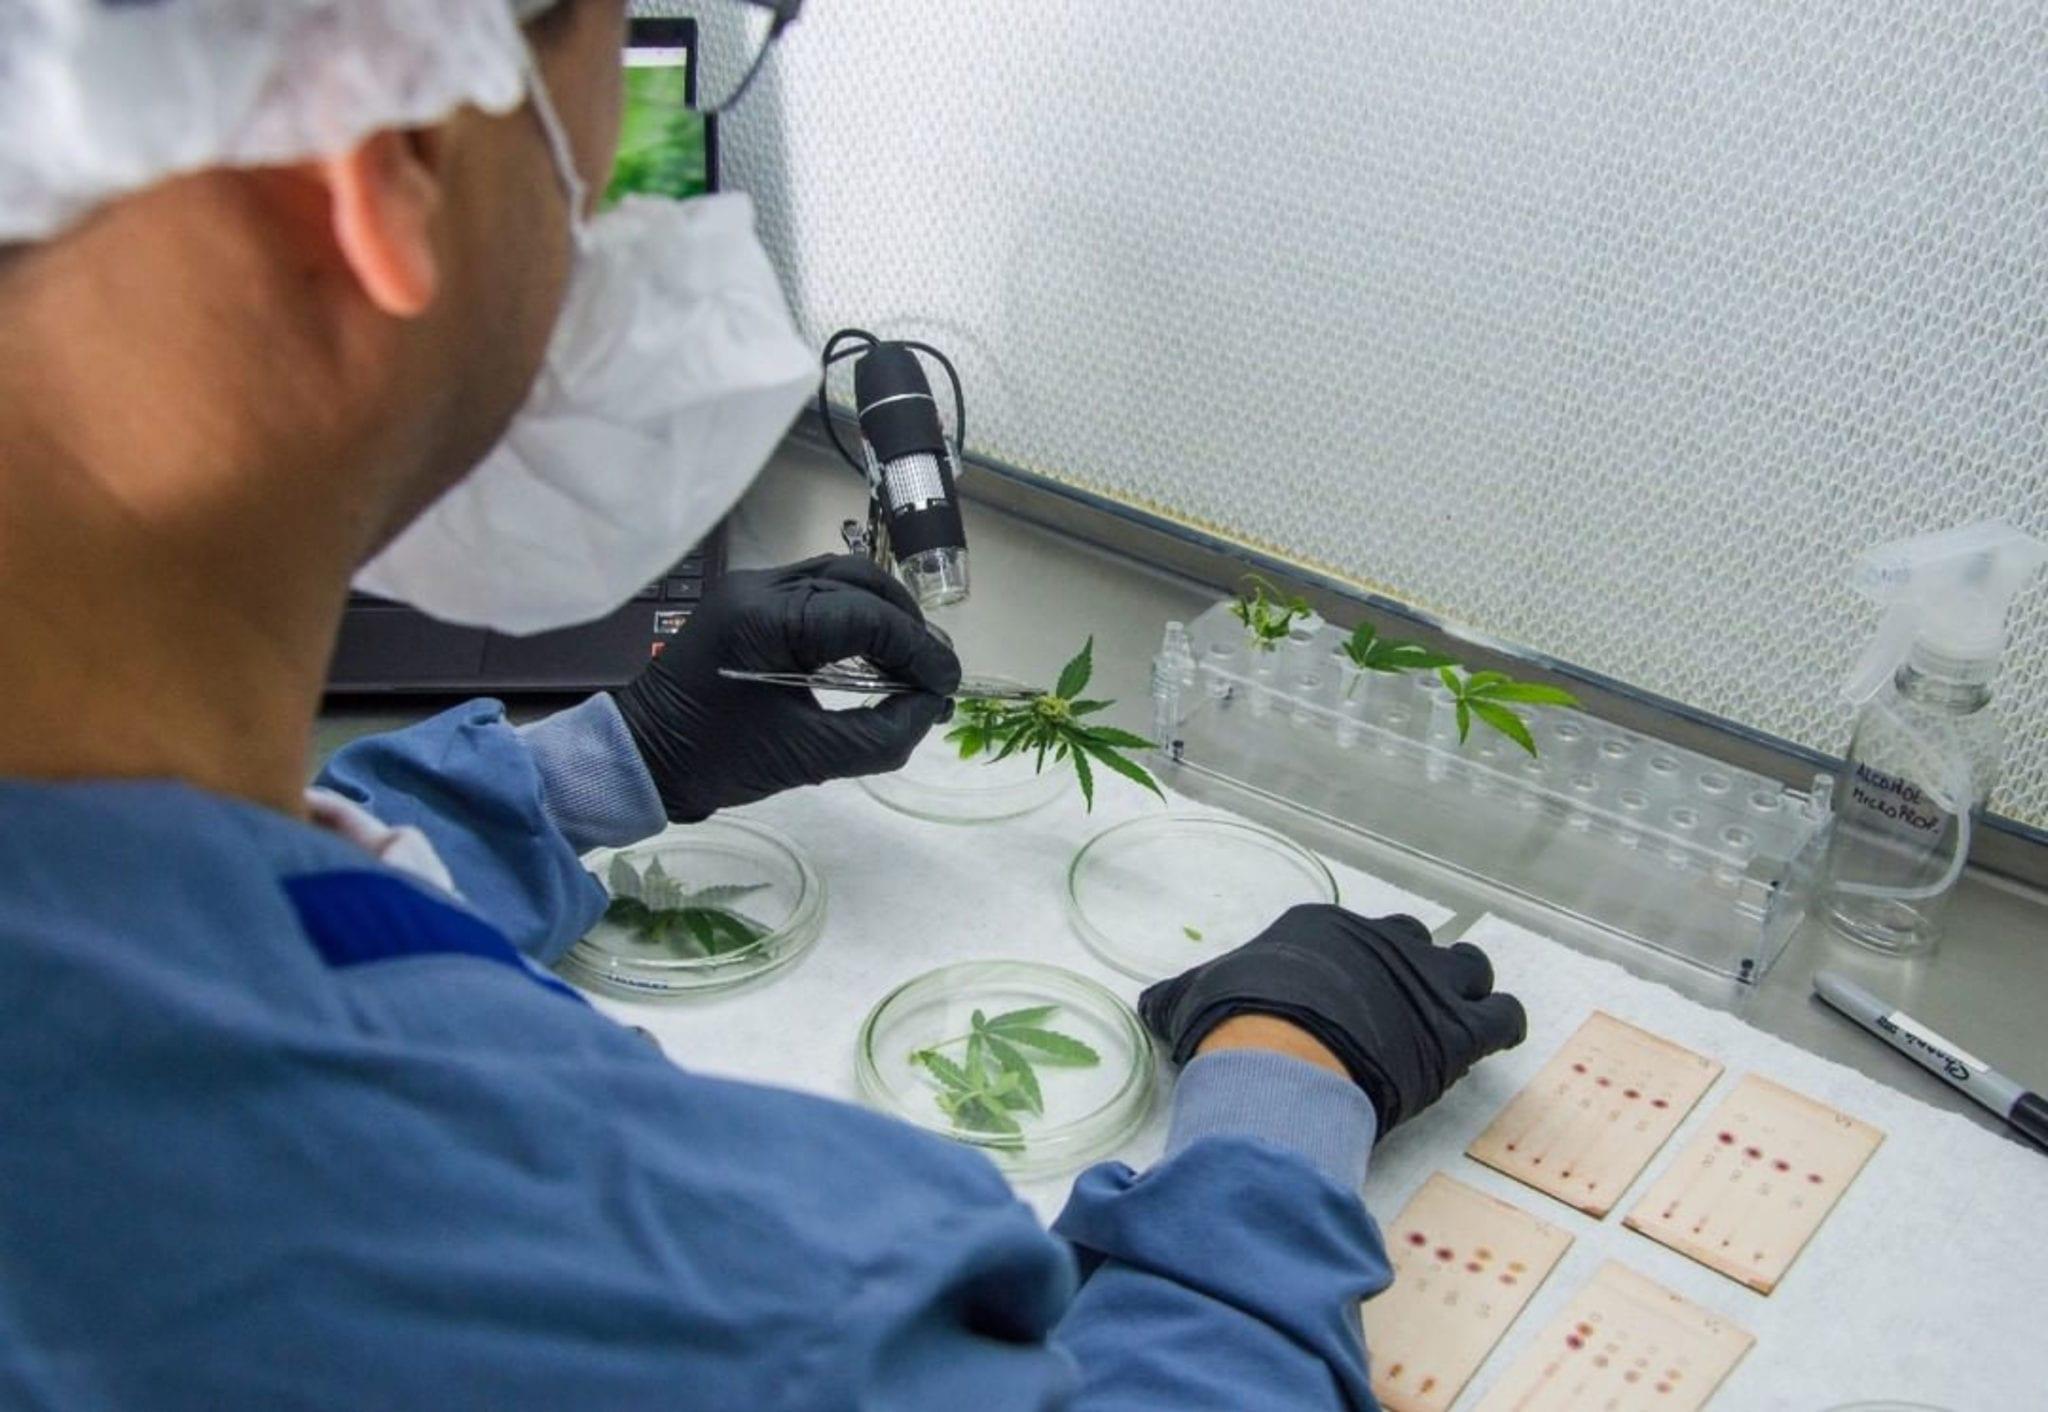 New study shows cannabis oil slows coronavirus replication, Ikänik Farms says